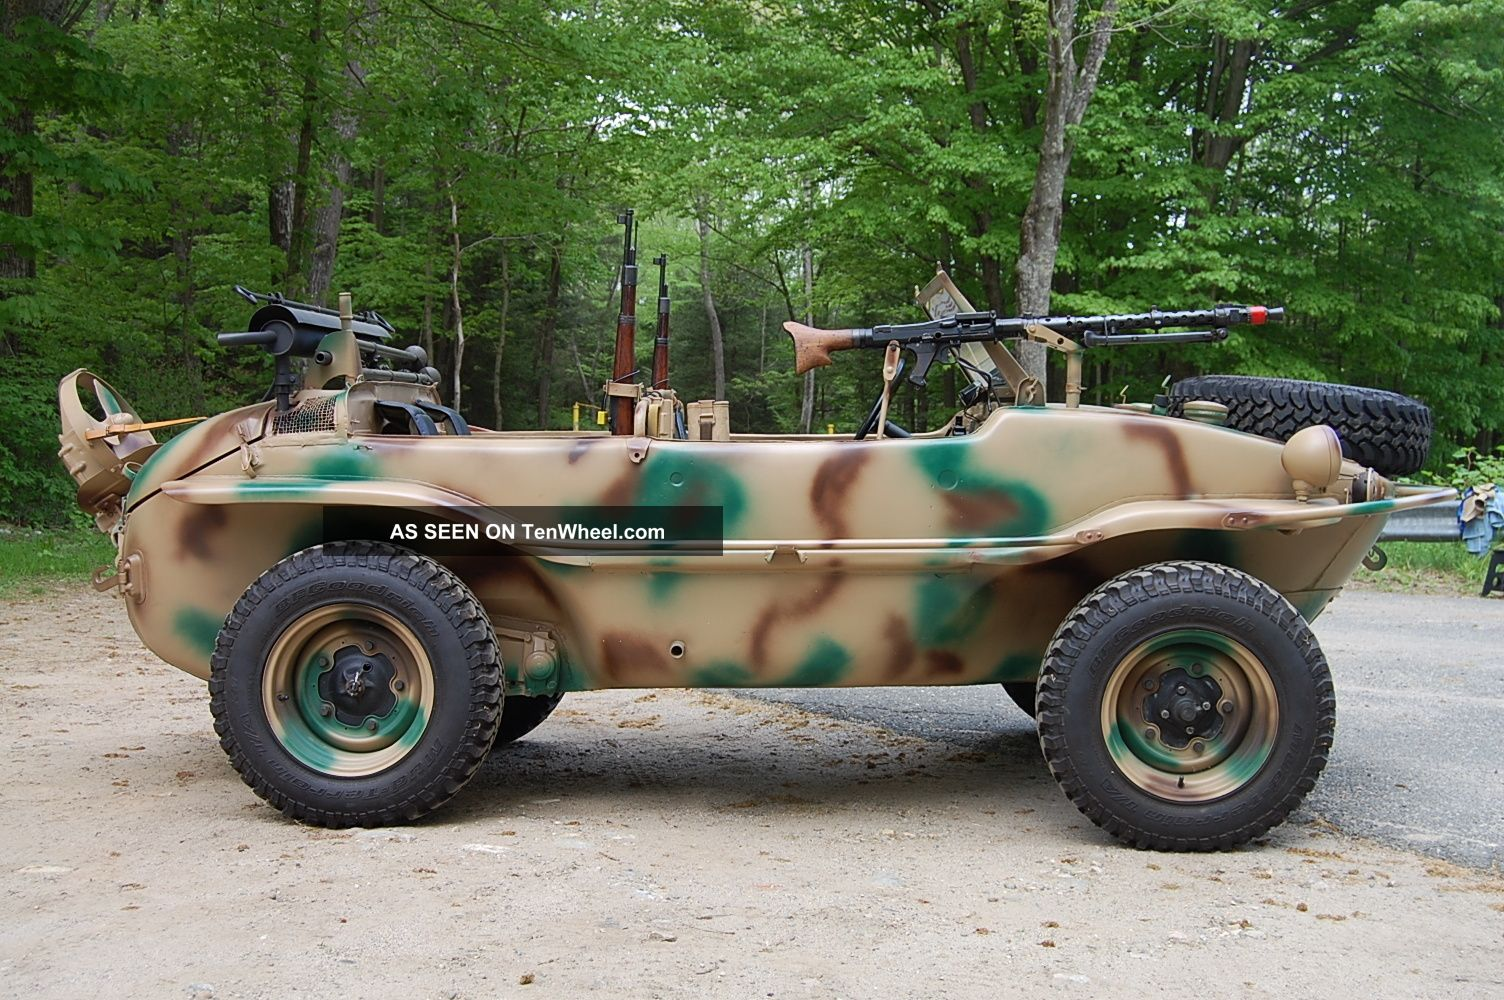 1943 Vw Schwimmwagen German Military Amphibious Vehicle Totally Type166